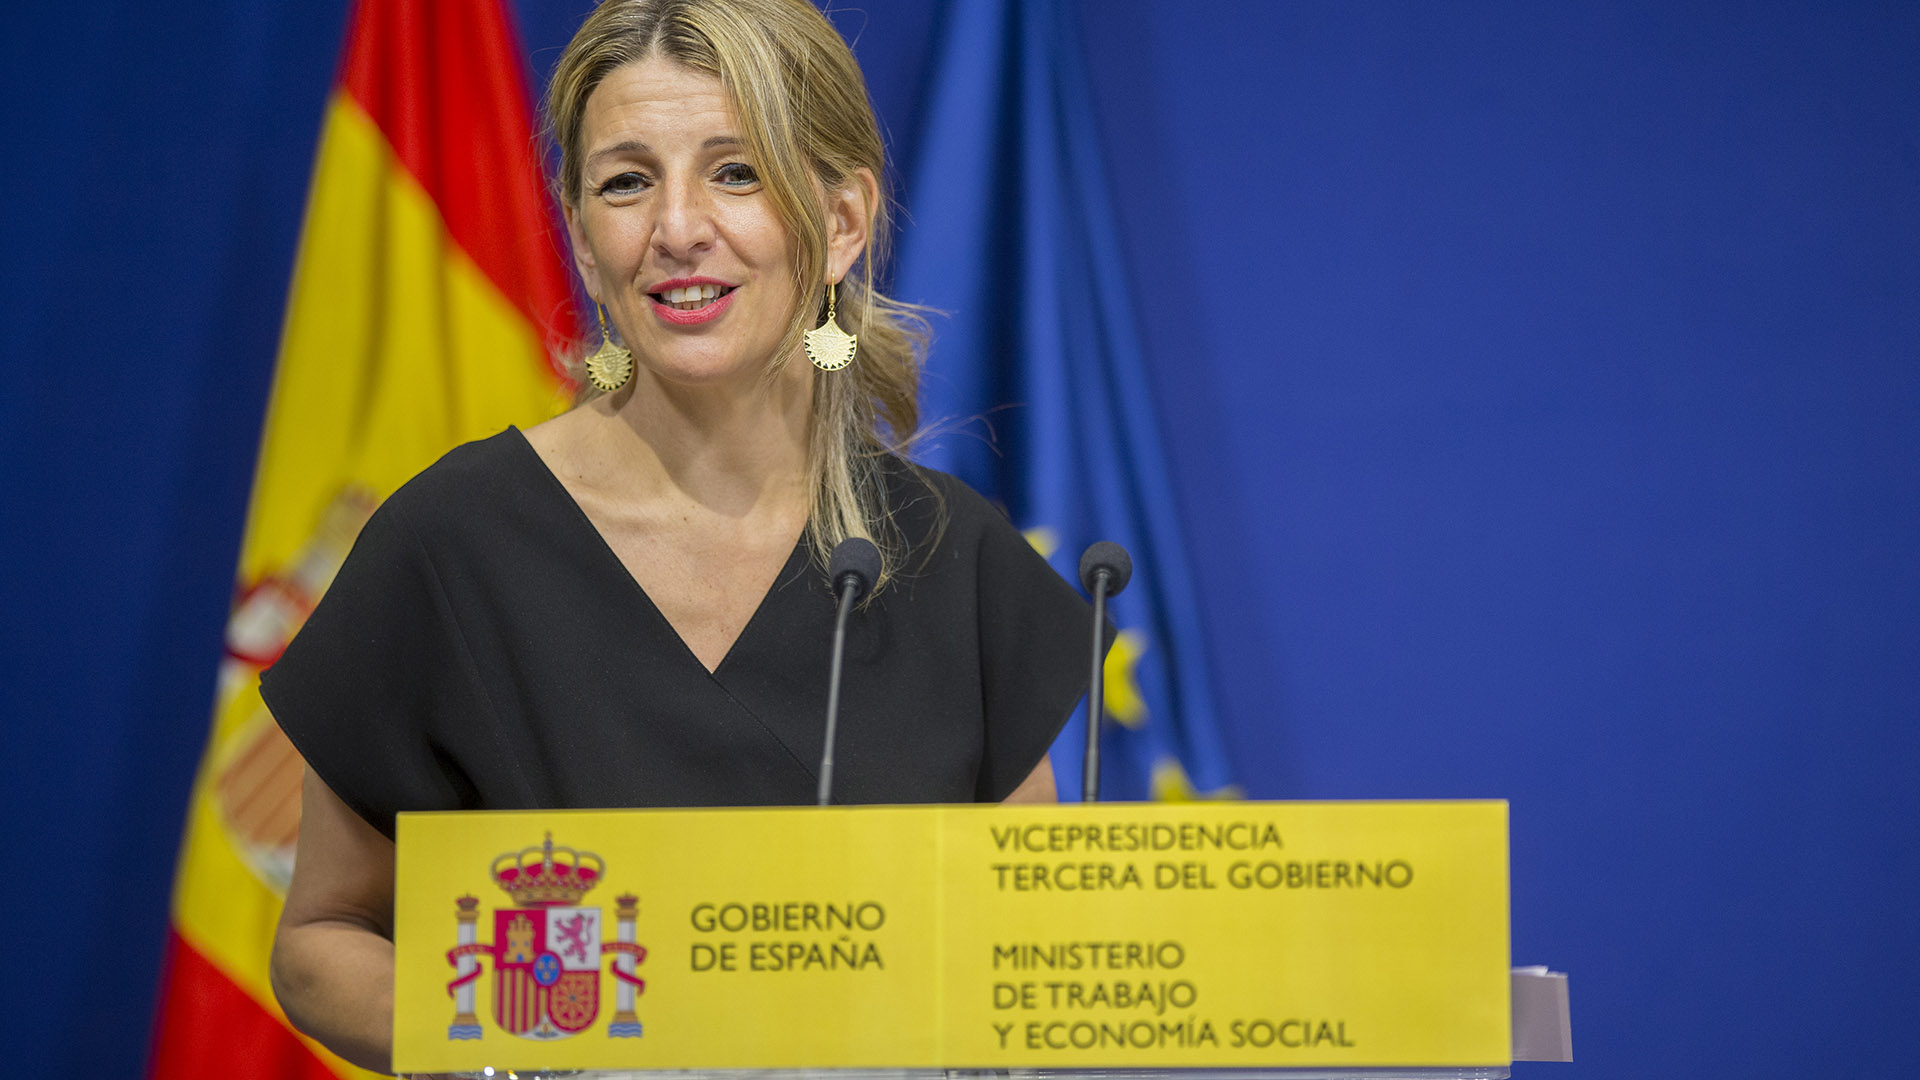 Ministra de trabajo y vicepresidenta tercera, Yolanda Diaz.